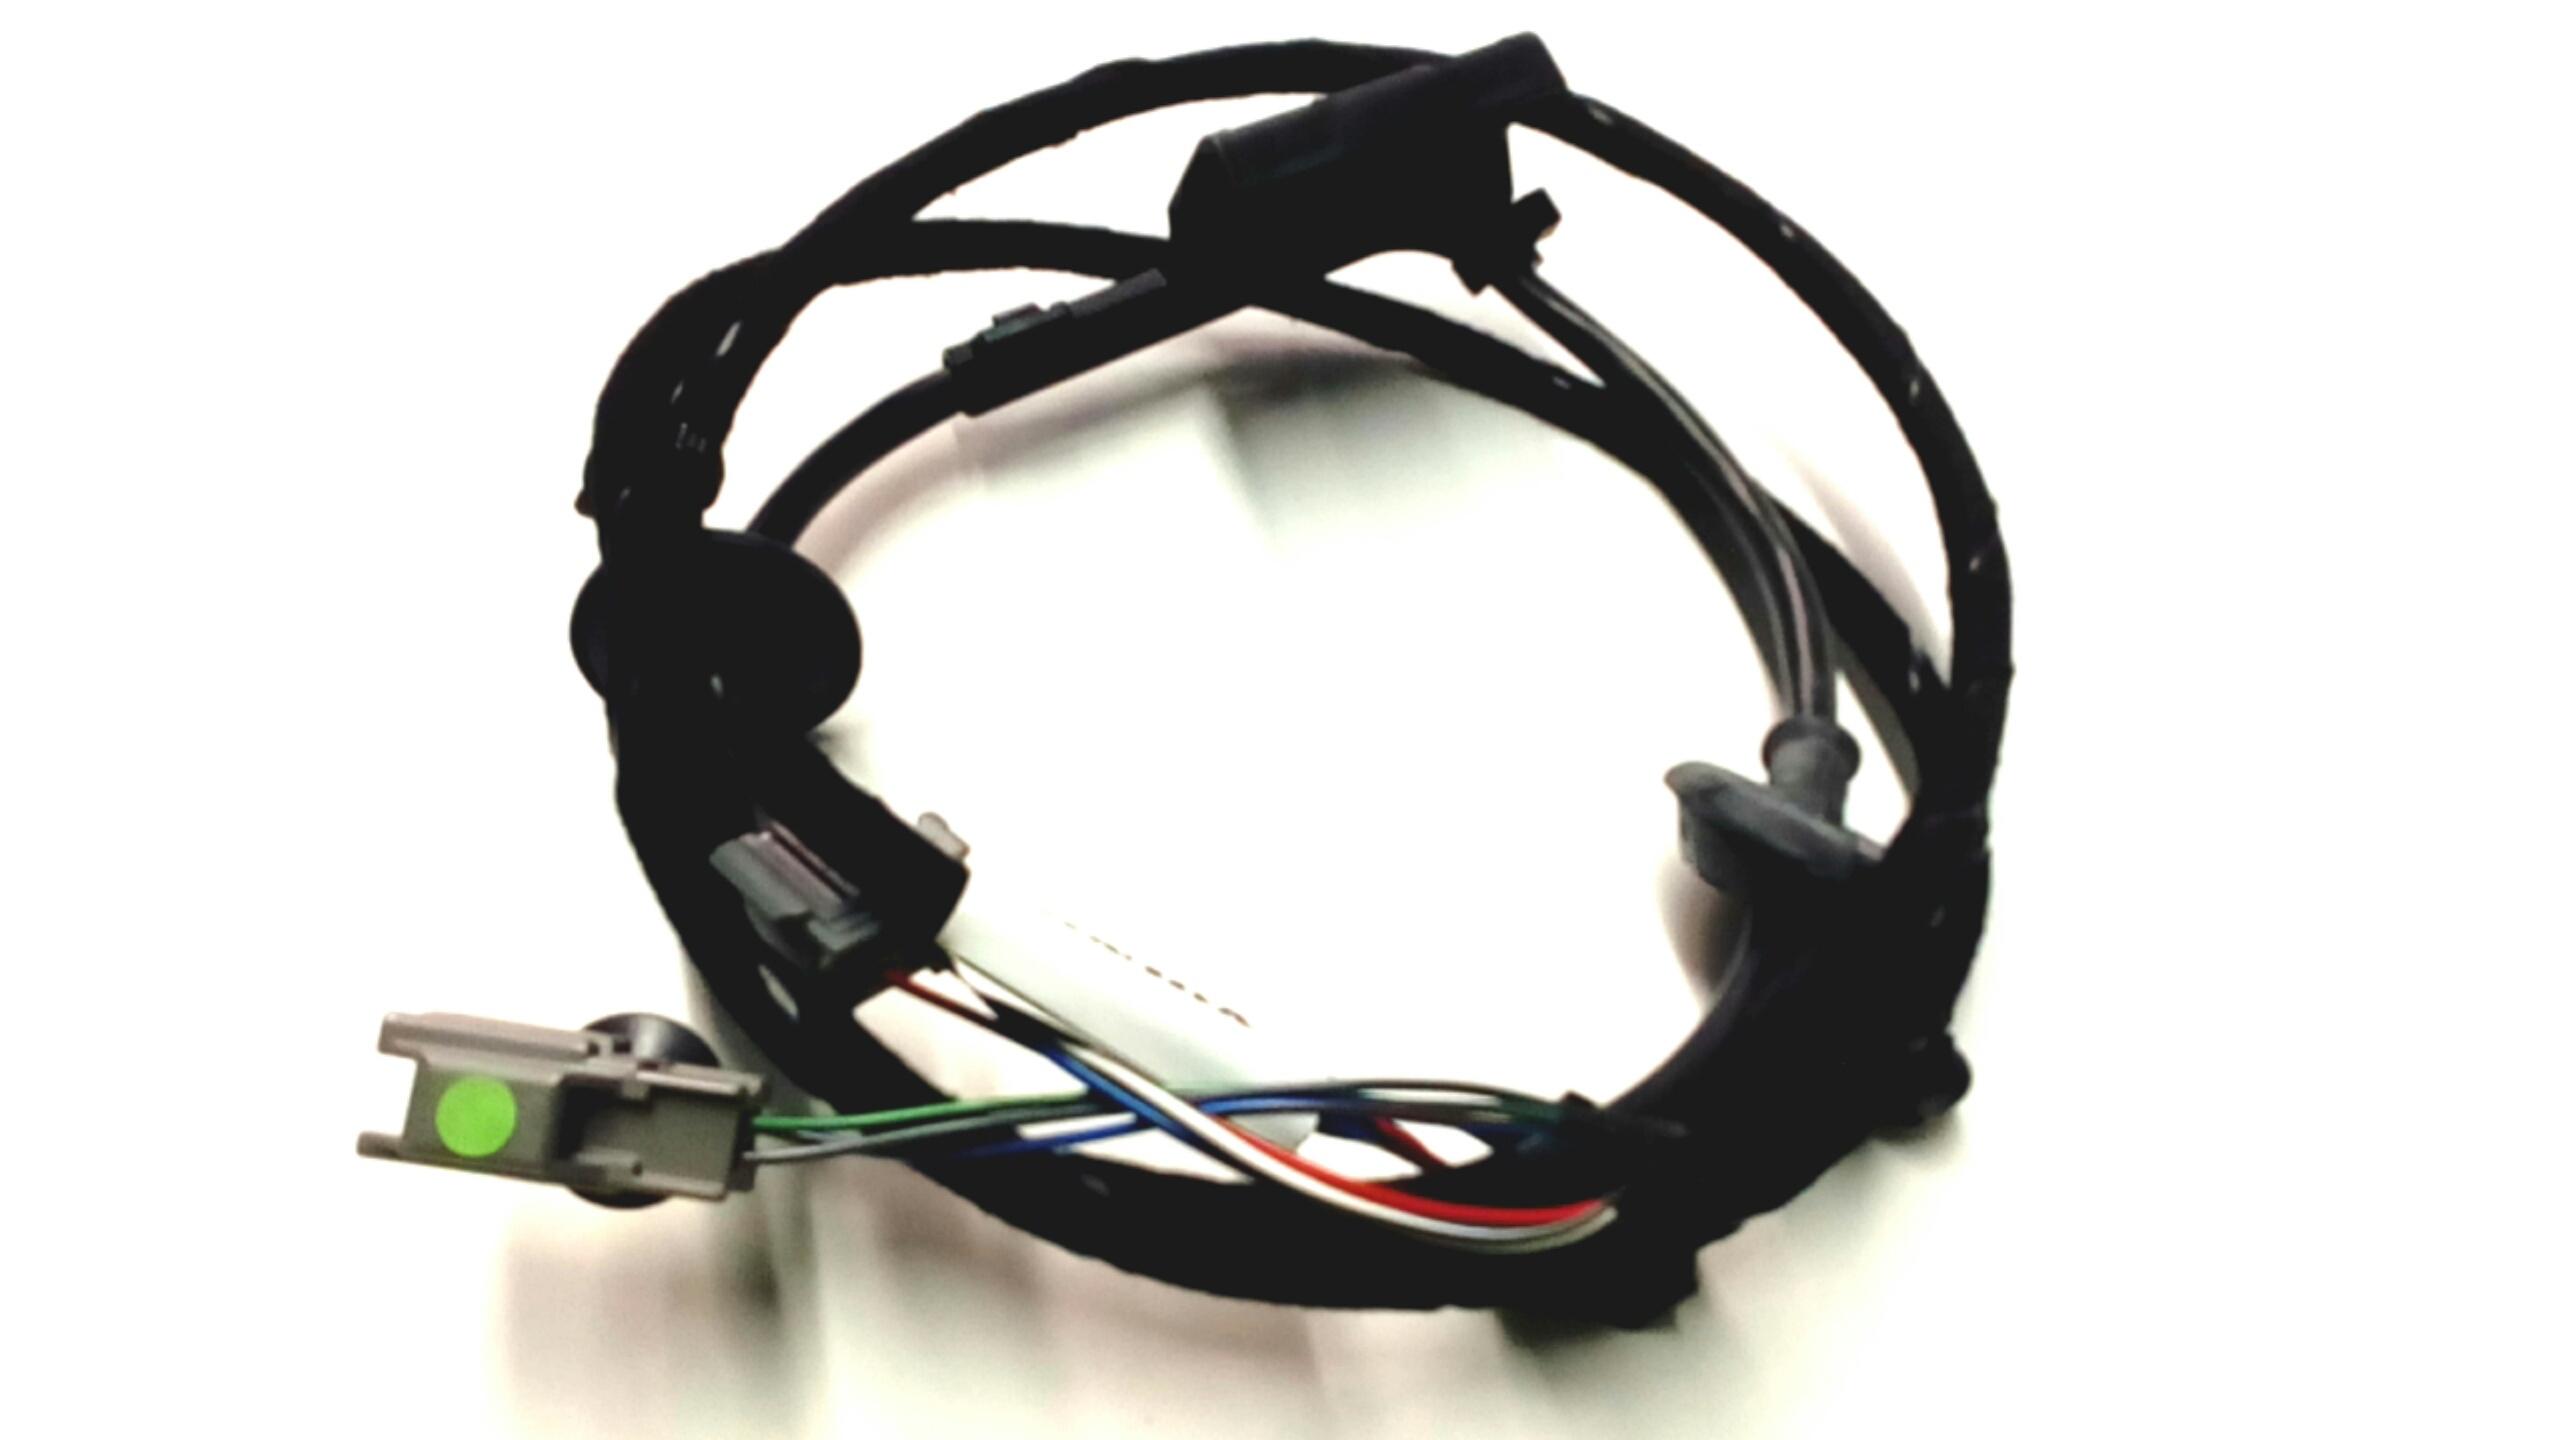 Volvo S80 Wiring Harness